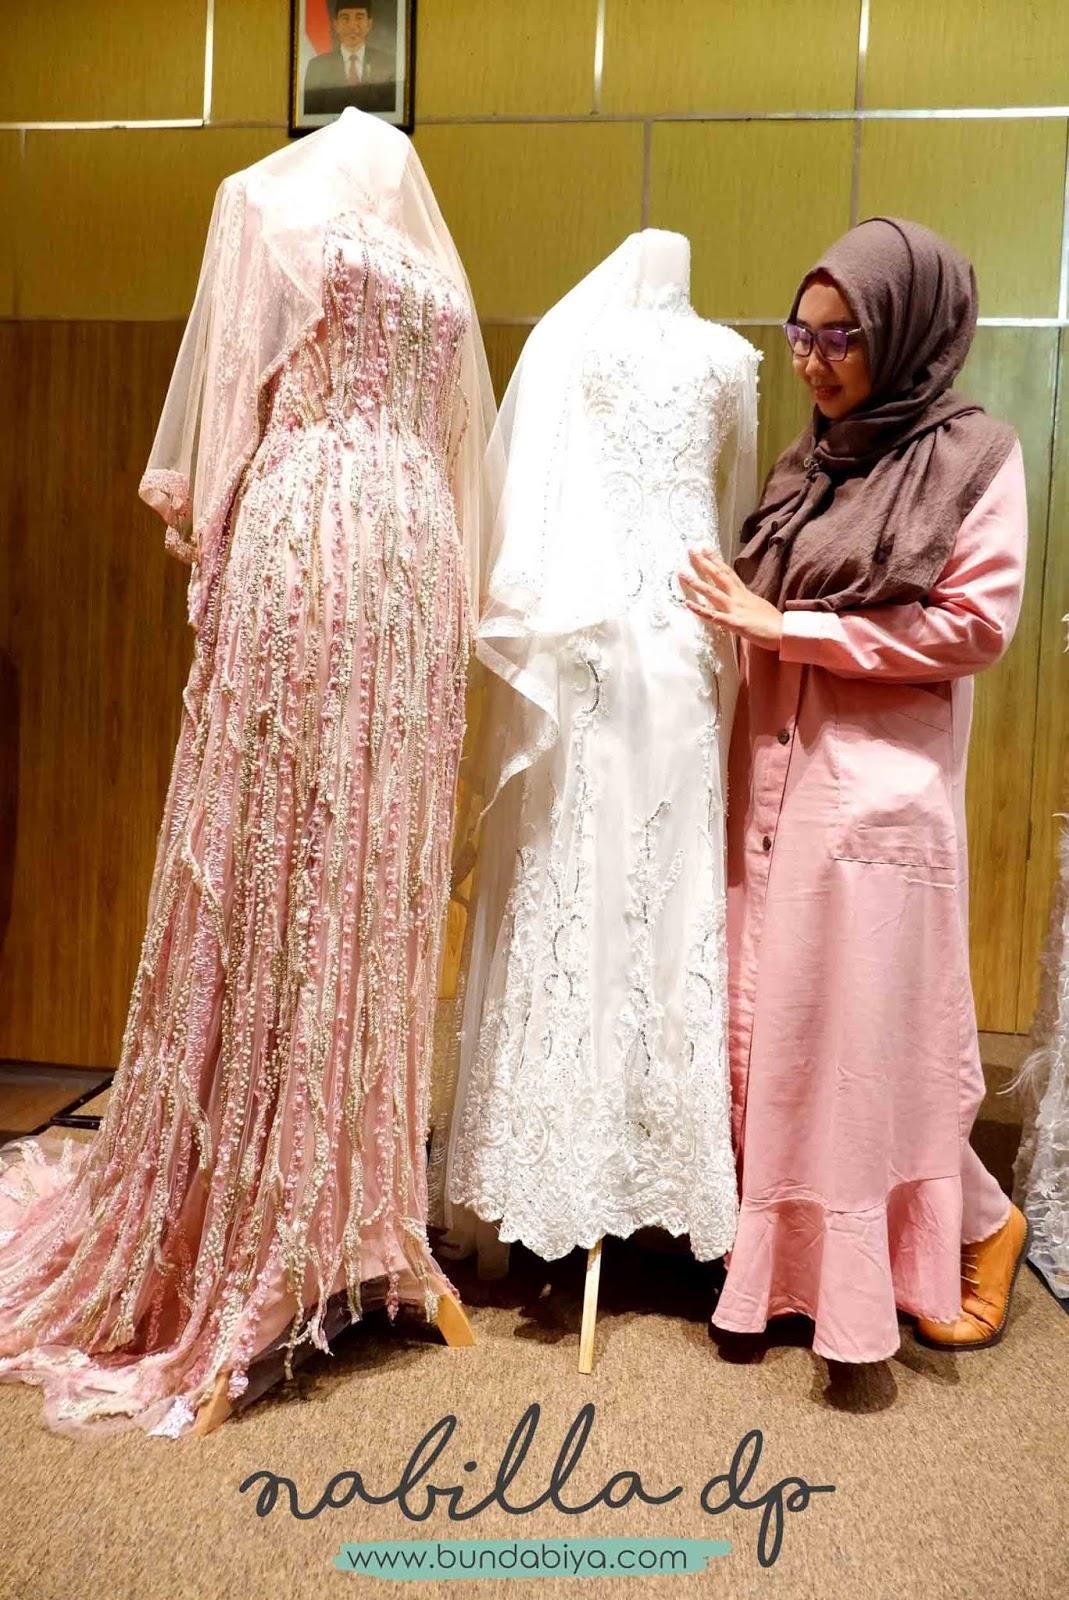 Persiapan Menikah Untuk Muslimah: Mudah, Berkelas, dan Berkah